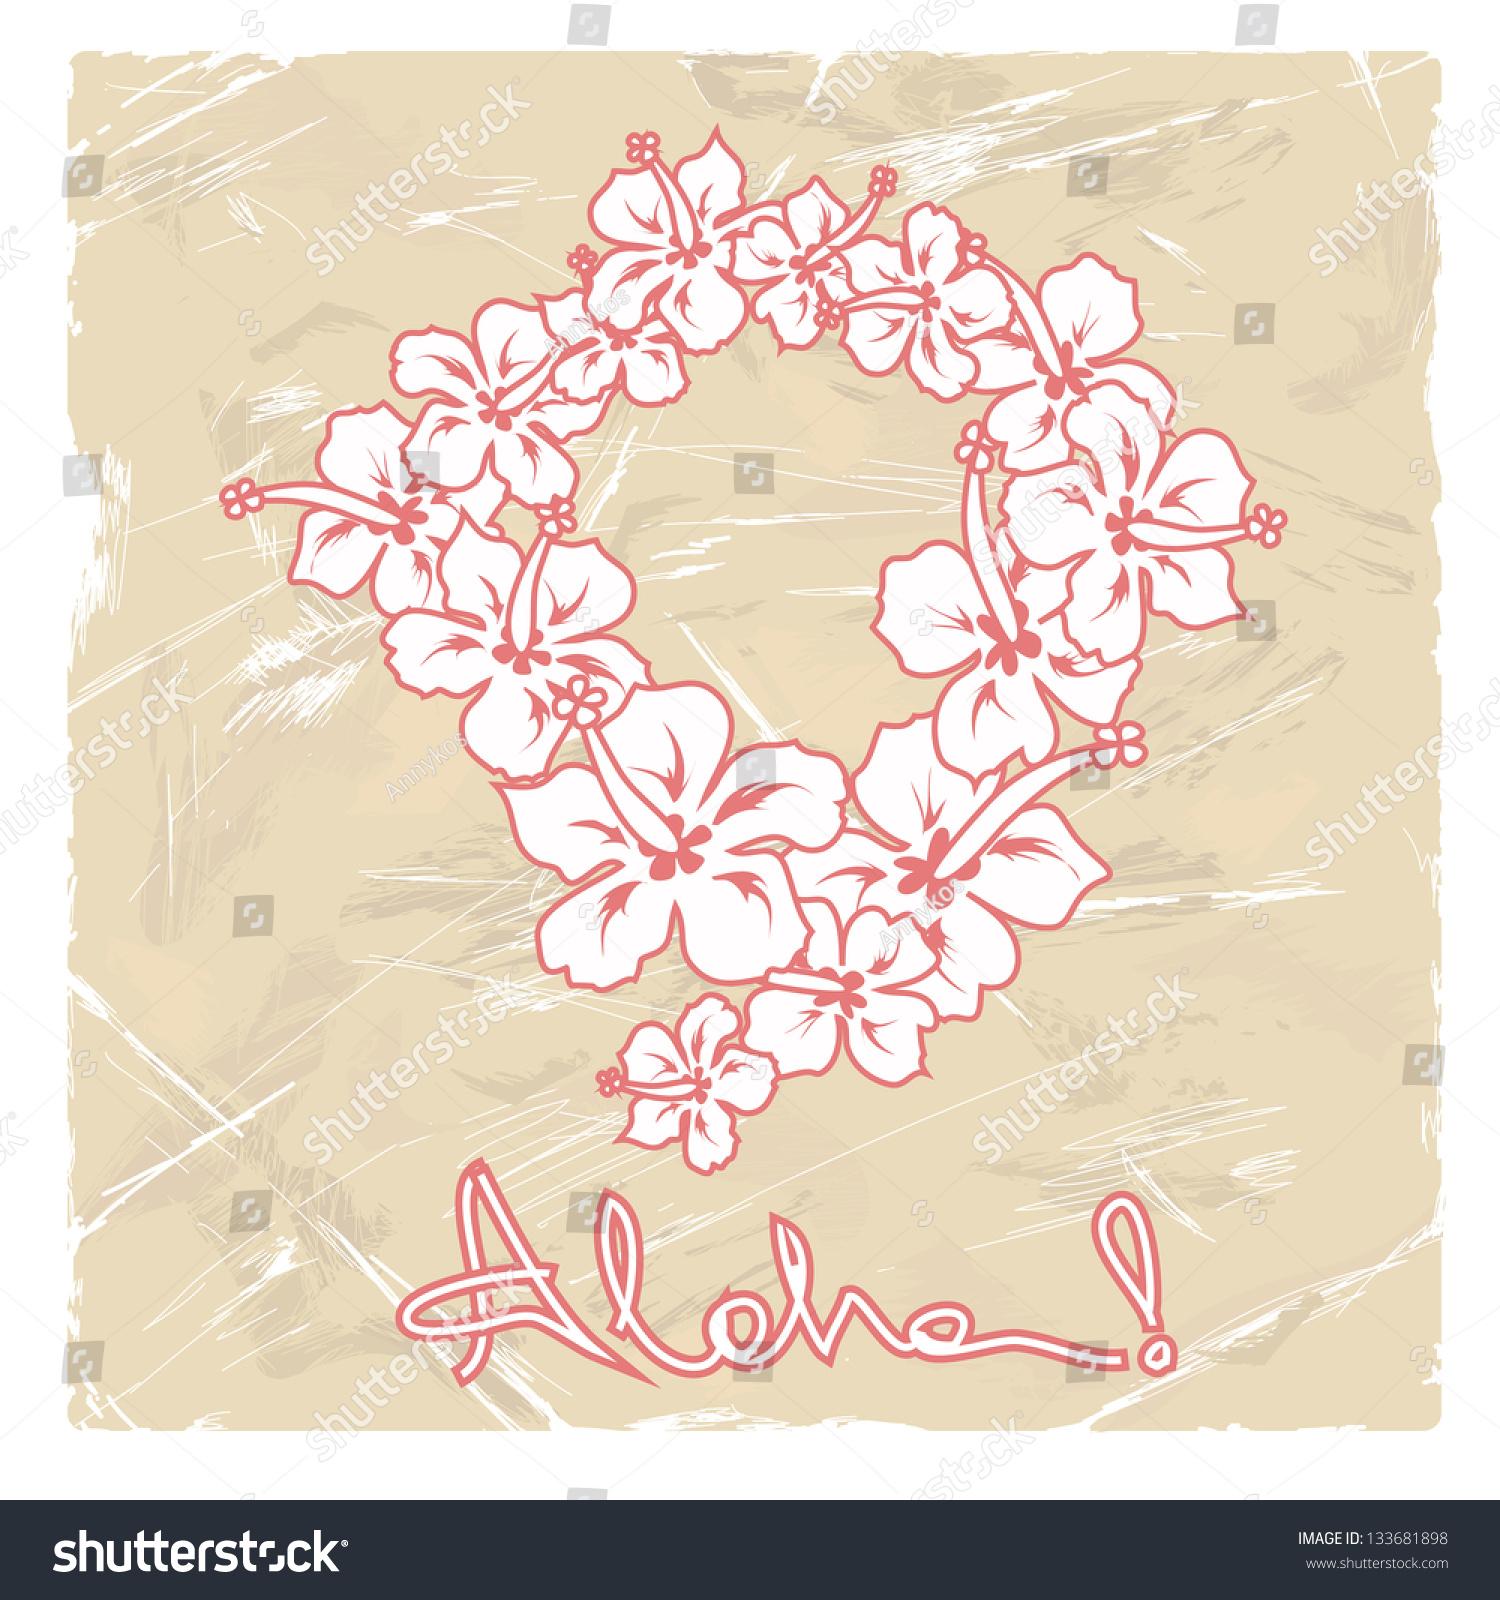 Illustration hawaiian flower garland on retro stock vector royalty illustration of hawaiian flower garland on a retro background izmirmasajfo